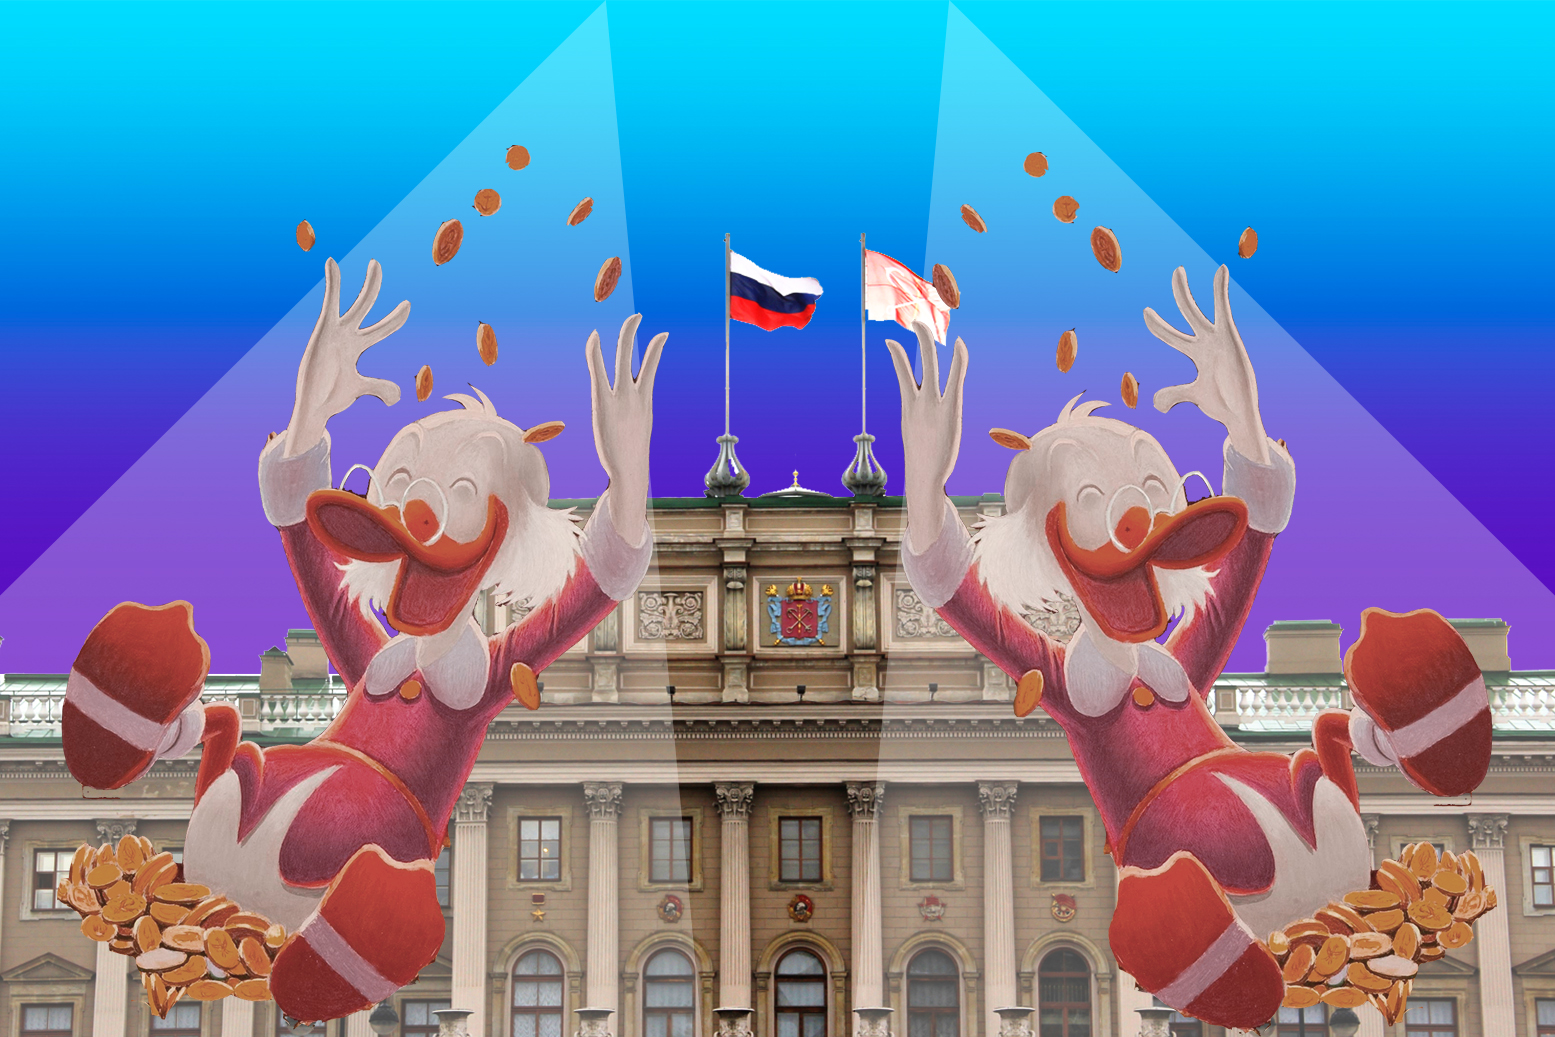 Проезд втранспорте Петербурга с1января подорожает сразу на10 руб.